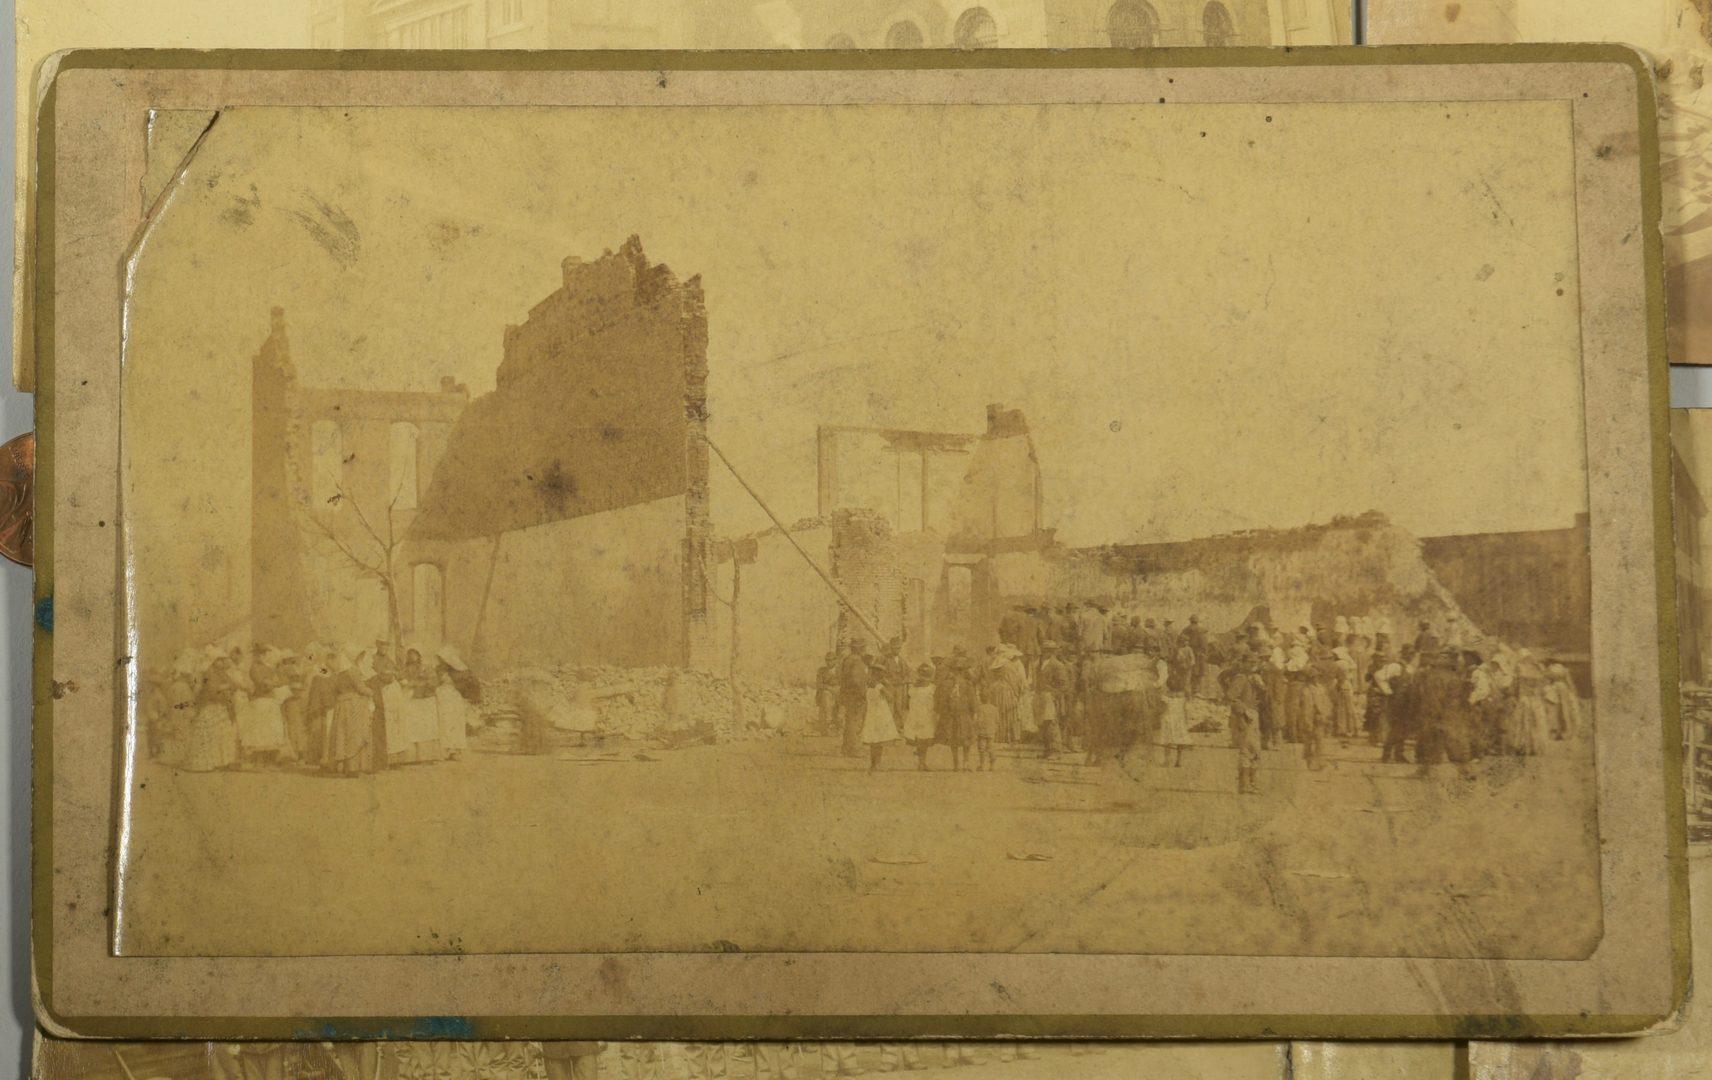 Lot 749: Cincinnati Riot of 1884 and Pulaski TN destruction, albumen prints